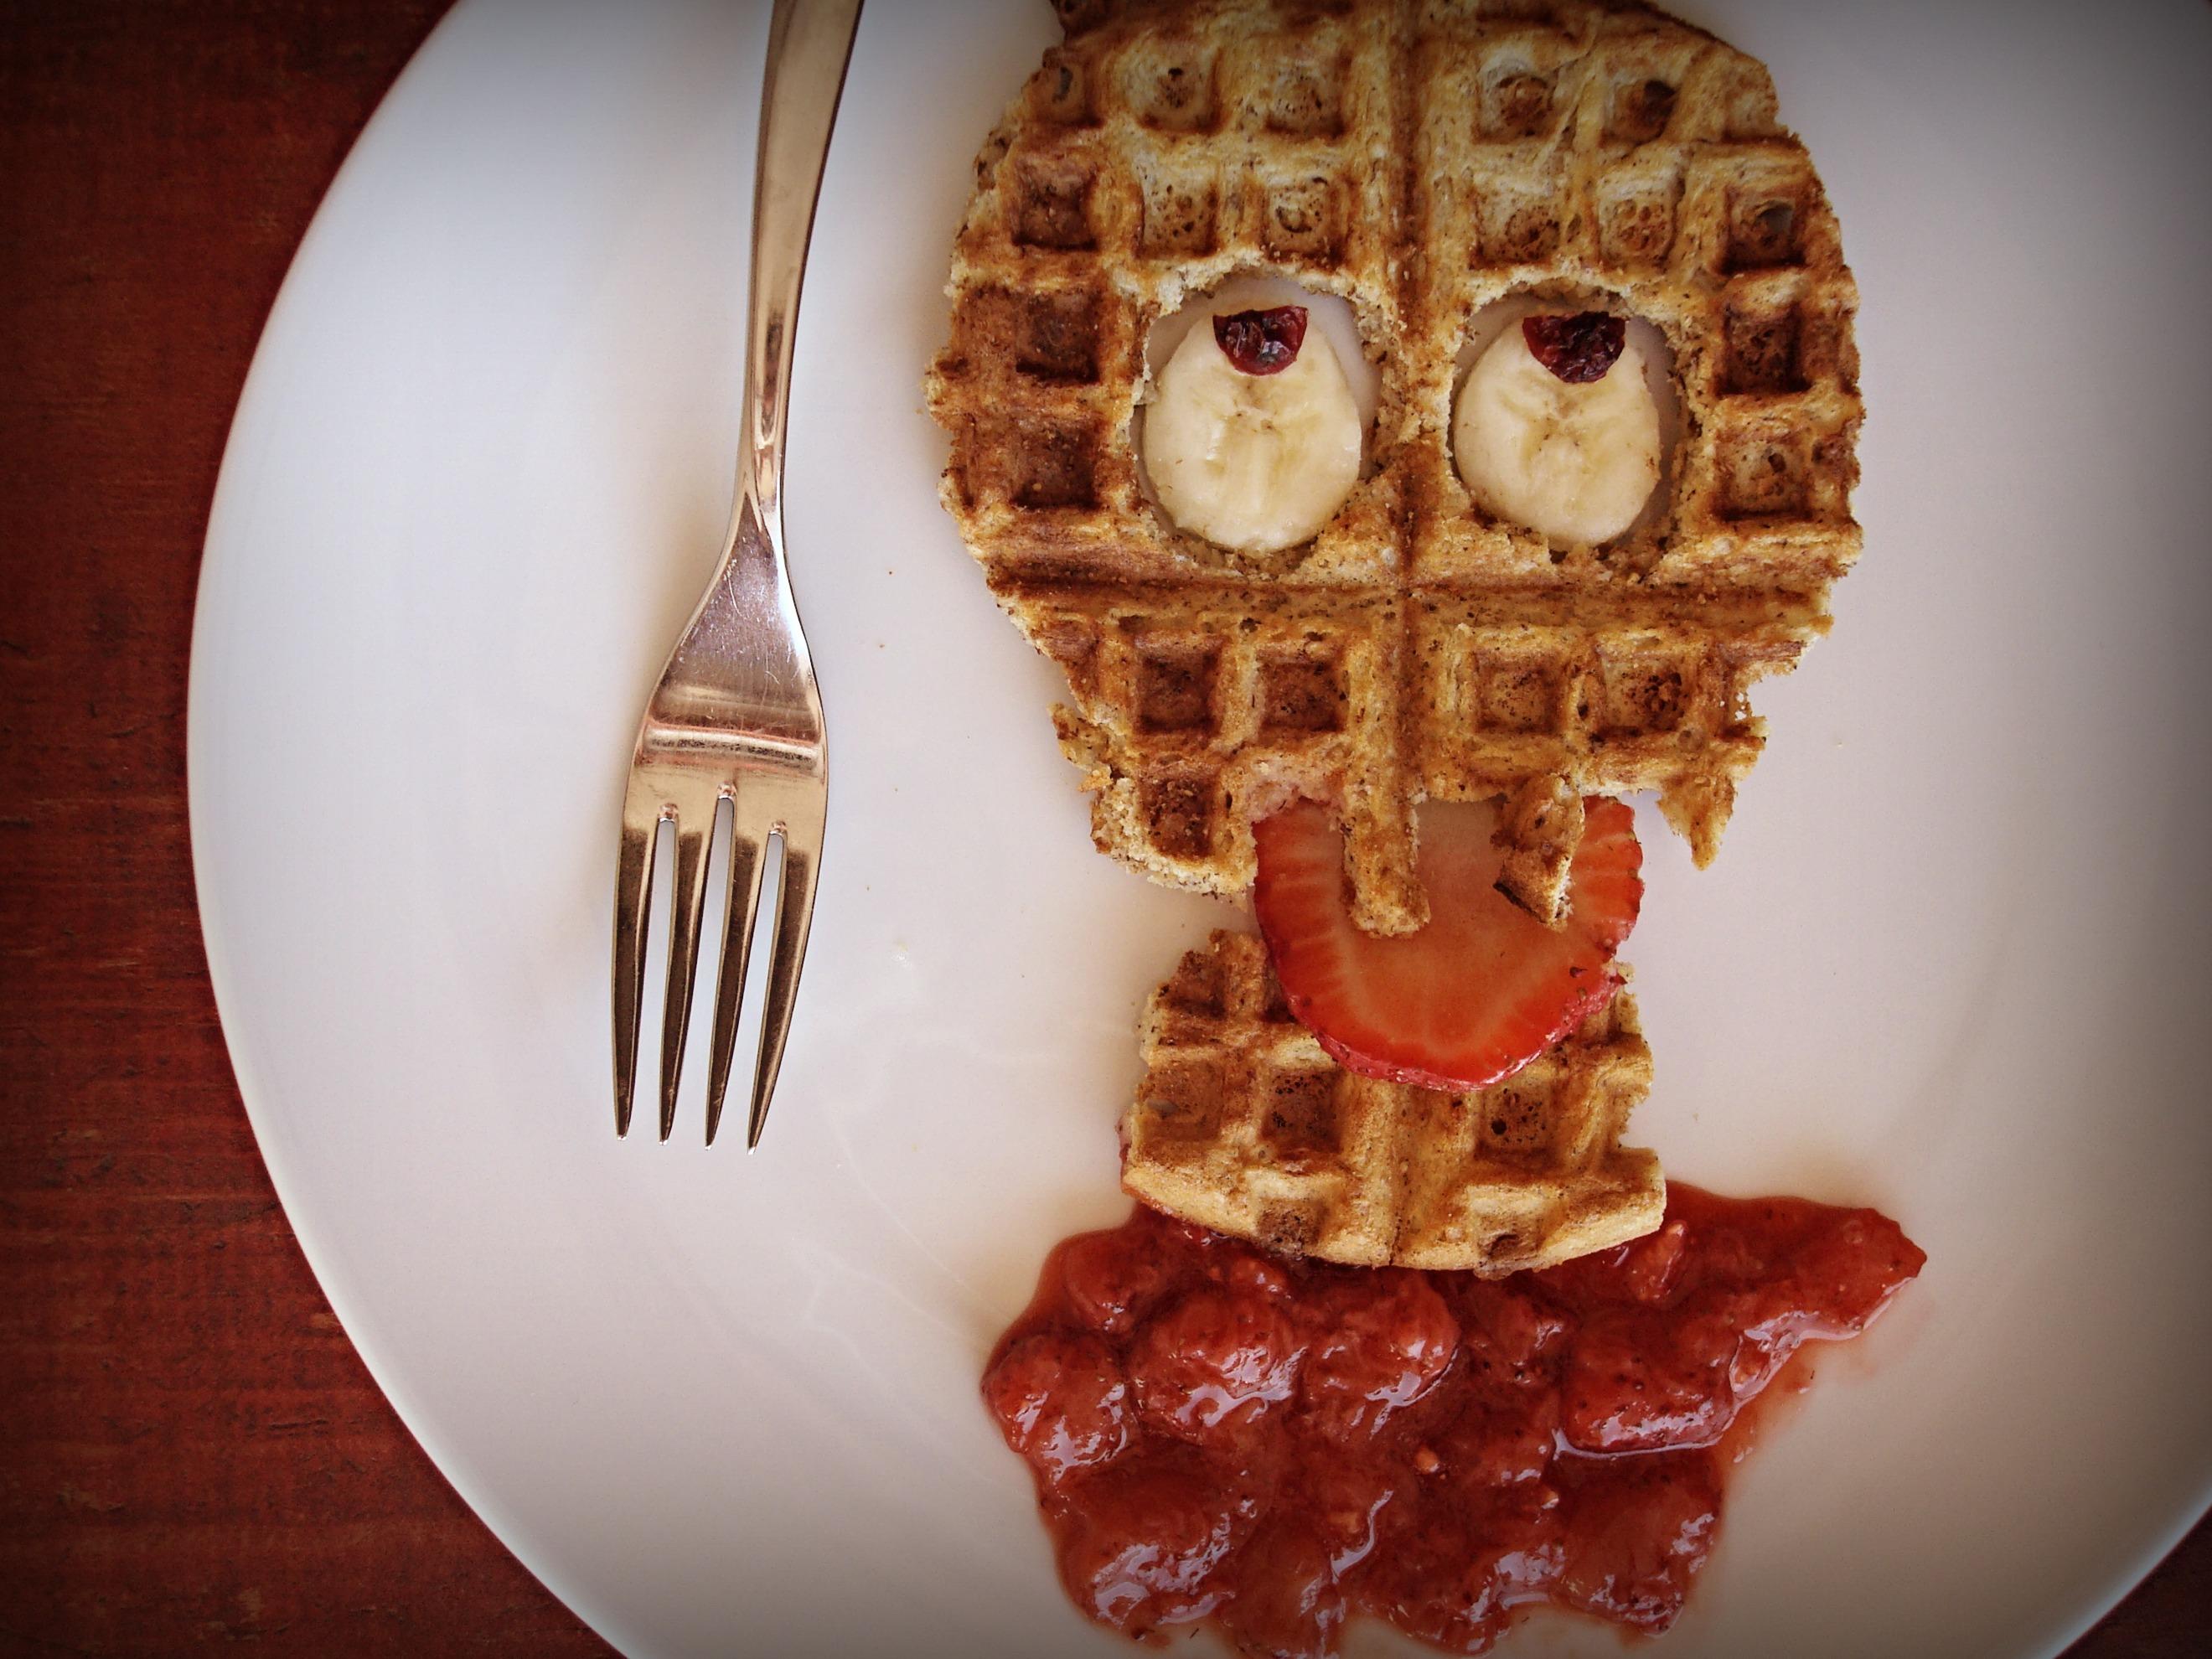 Skull-Shaped Waffles